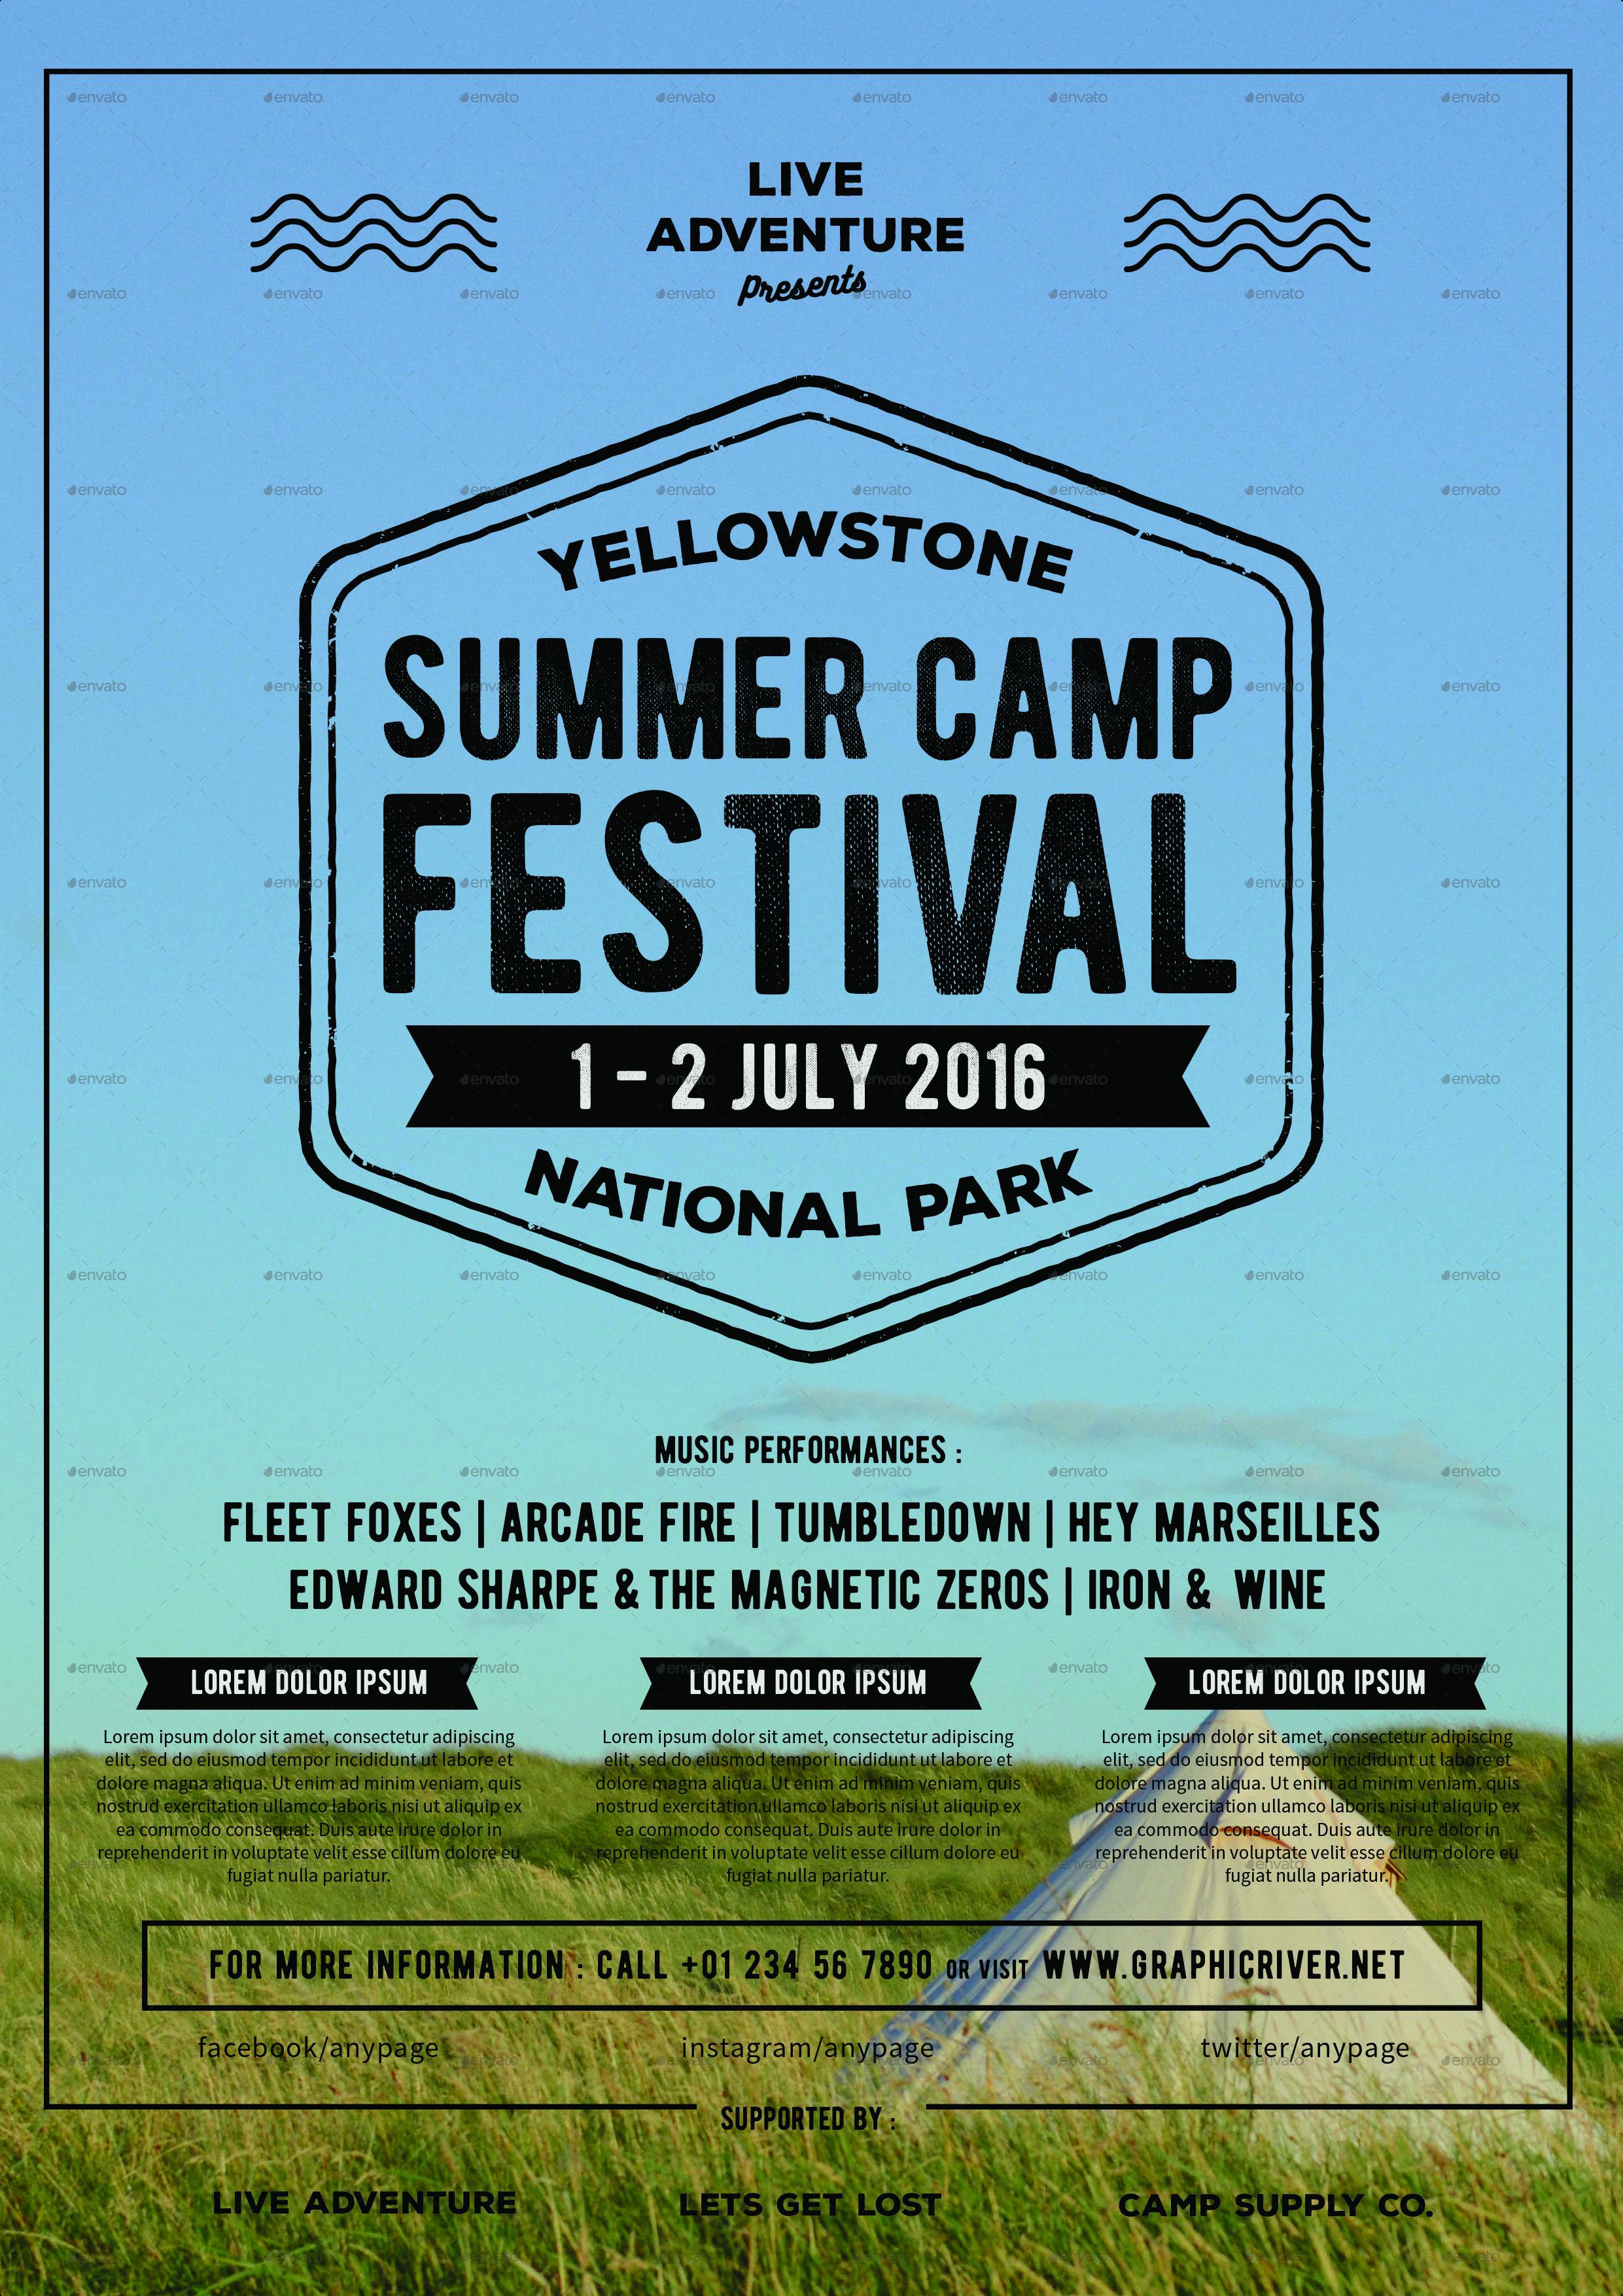 Summer Camp Flyer by dsc_studio | GraphicRiver